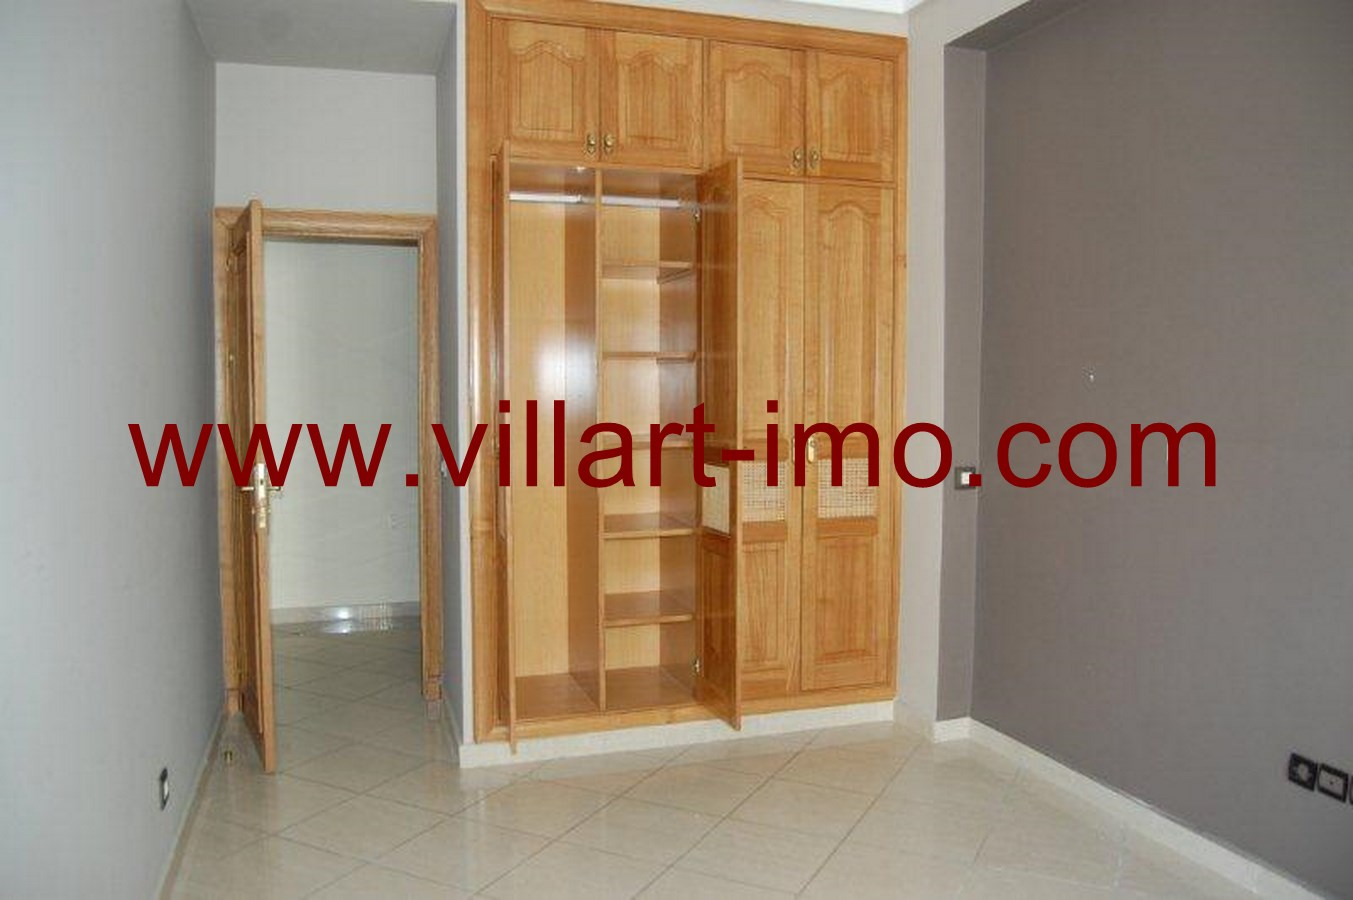 10-Location-Appartement-Non meublé-Tanger-Iberia-Chambre 3-L484-Villart immo